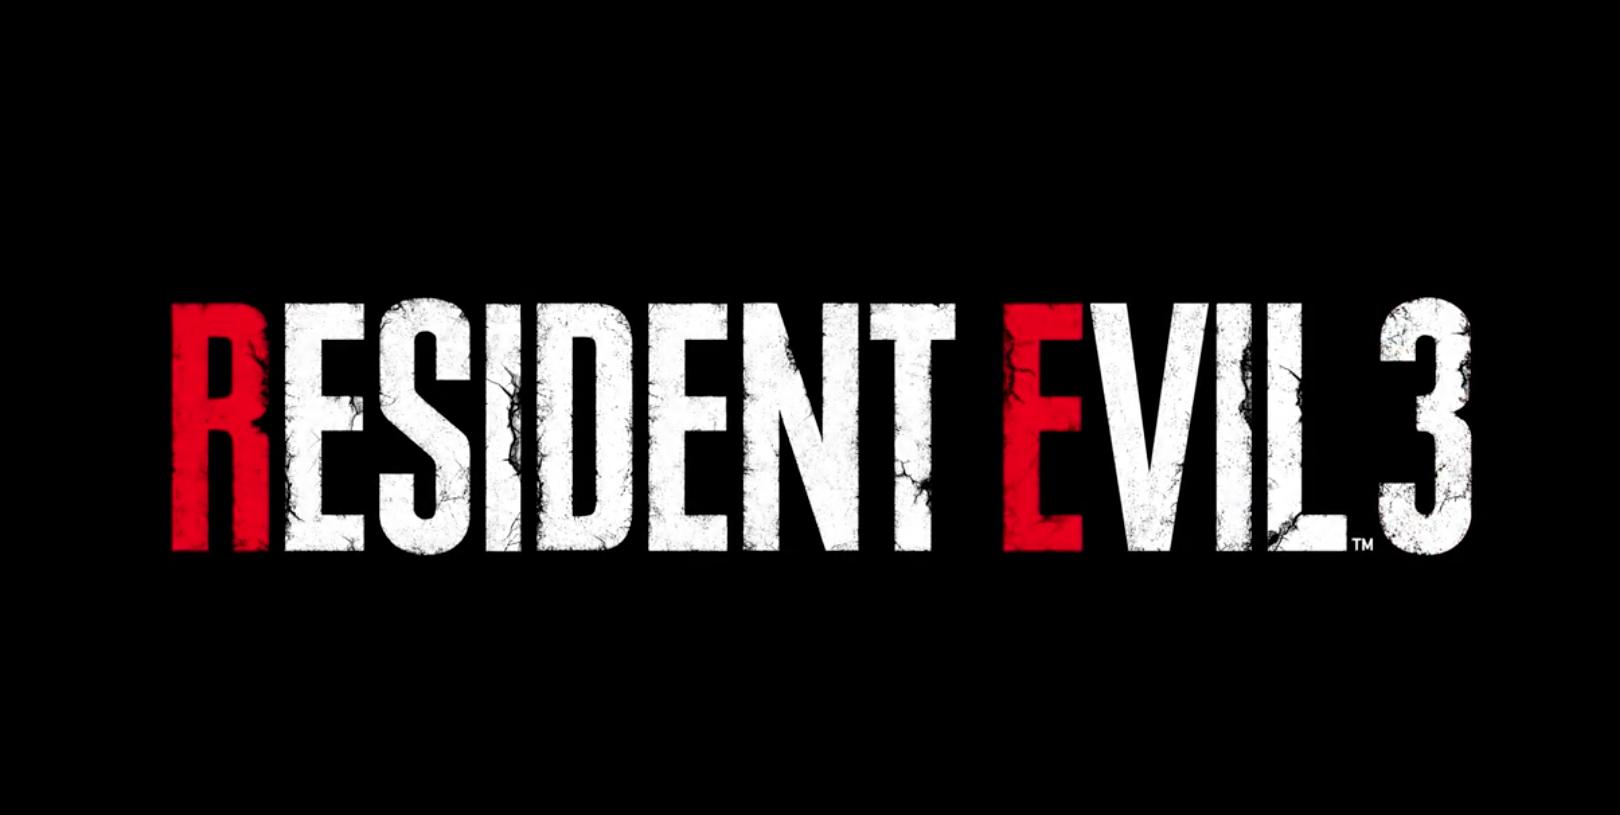 Resident Evil 3: Nemesis é anunciado para abril de 2020 – Confira o trailer